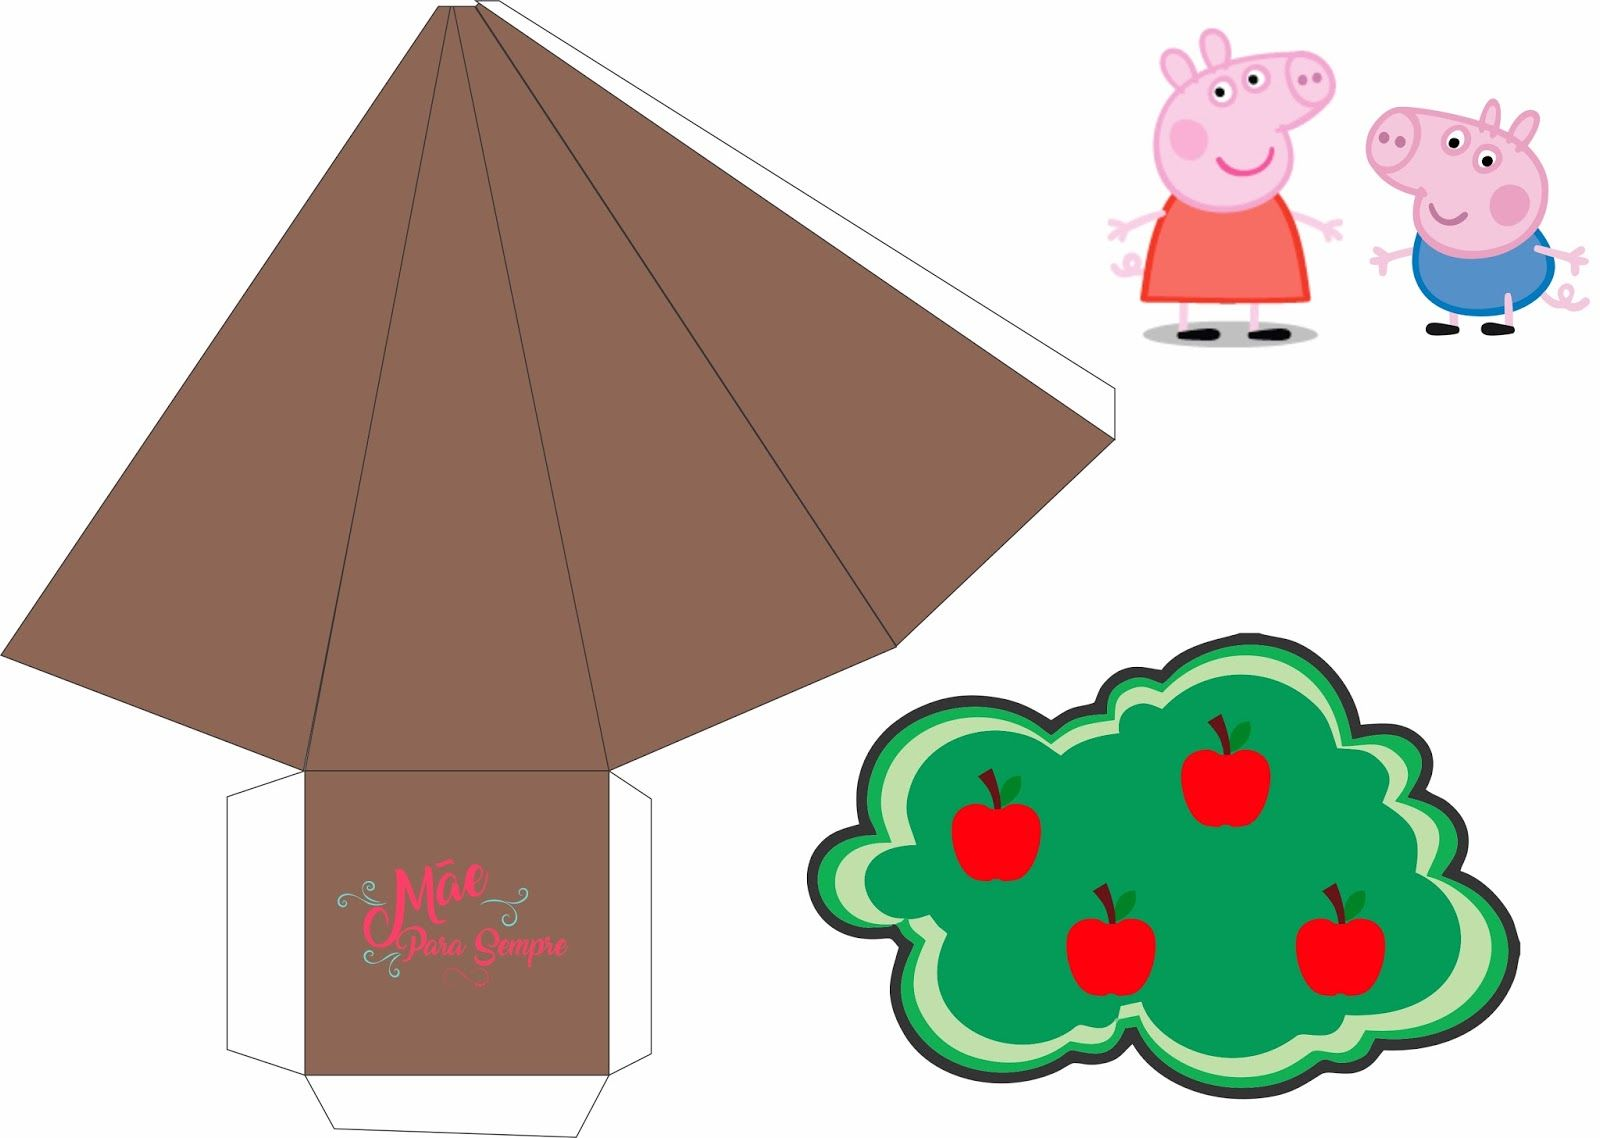 Imagens De Arvore Para Imprimir: Resultado De Imagem Para Molde Arvore Cone Safari Peppa Pig